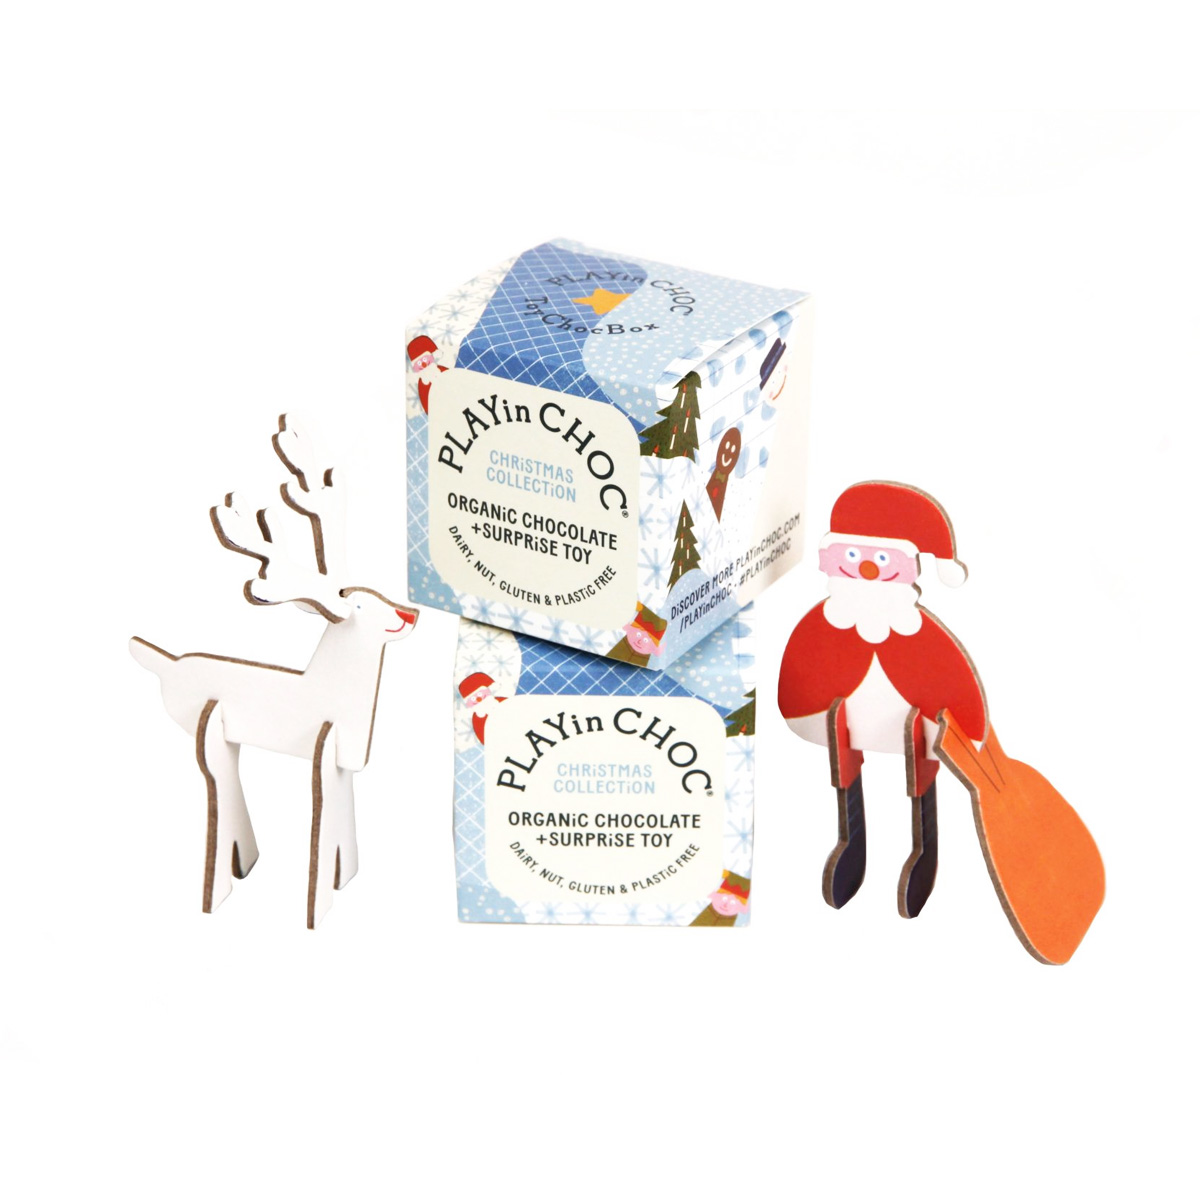 ToyChoc Box - Christmas Series (Vegan, GF, Organic) by PLAYin CHOC